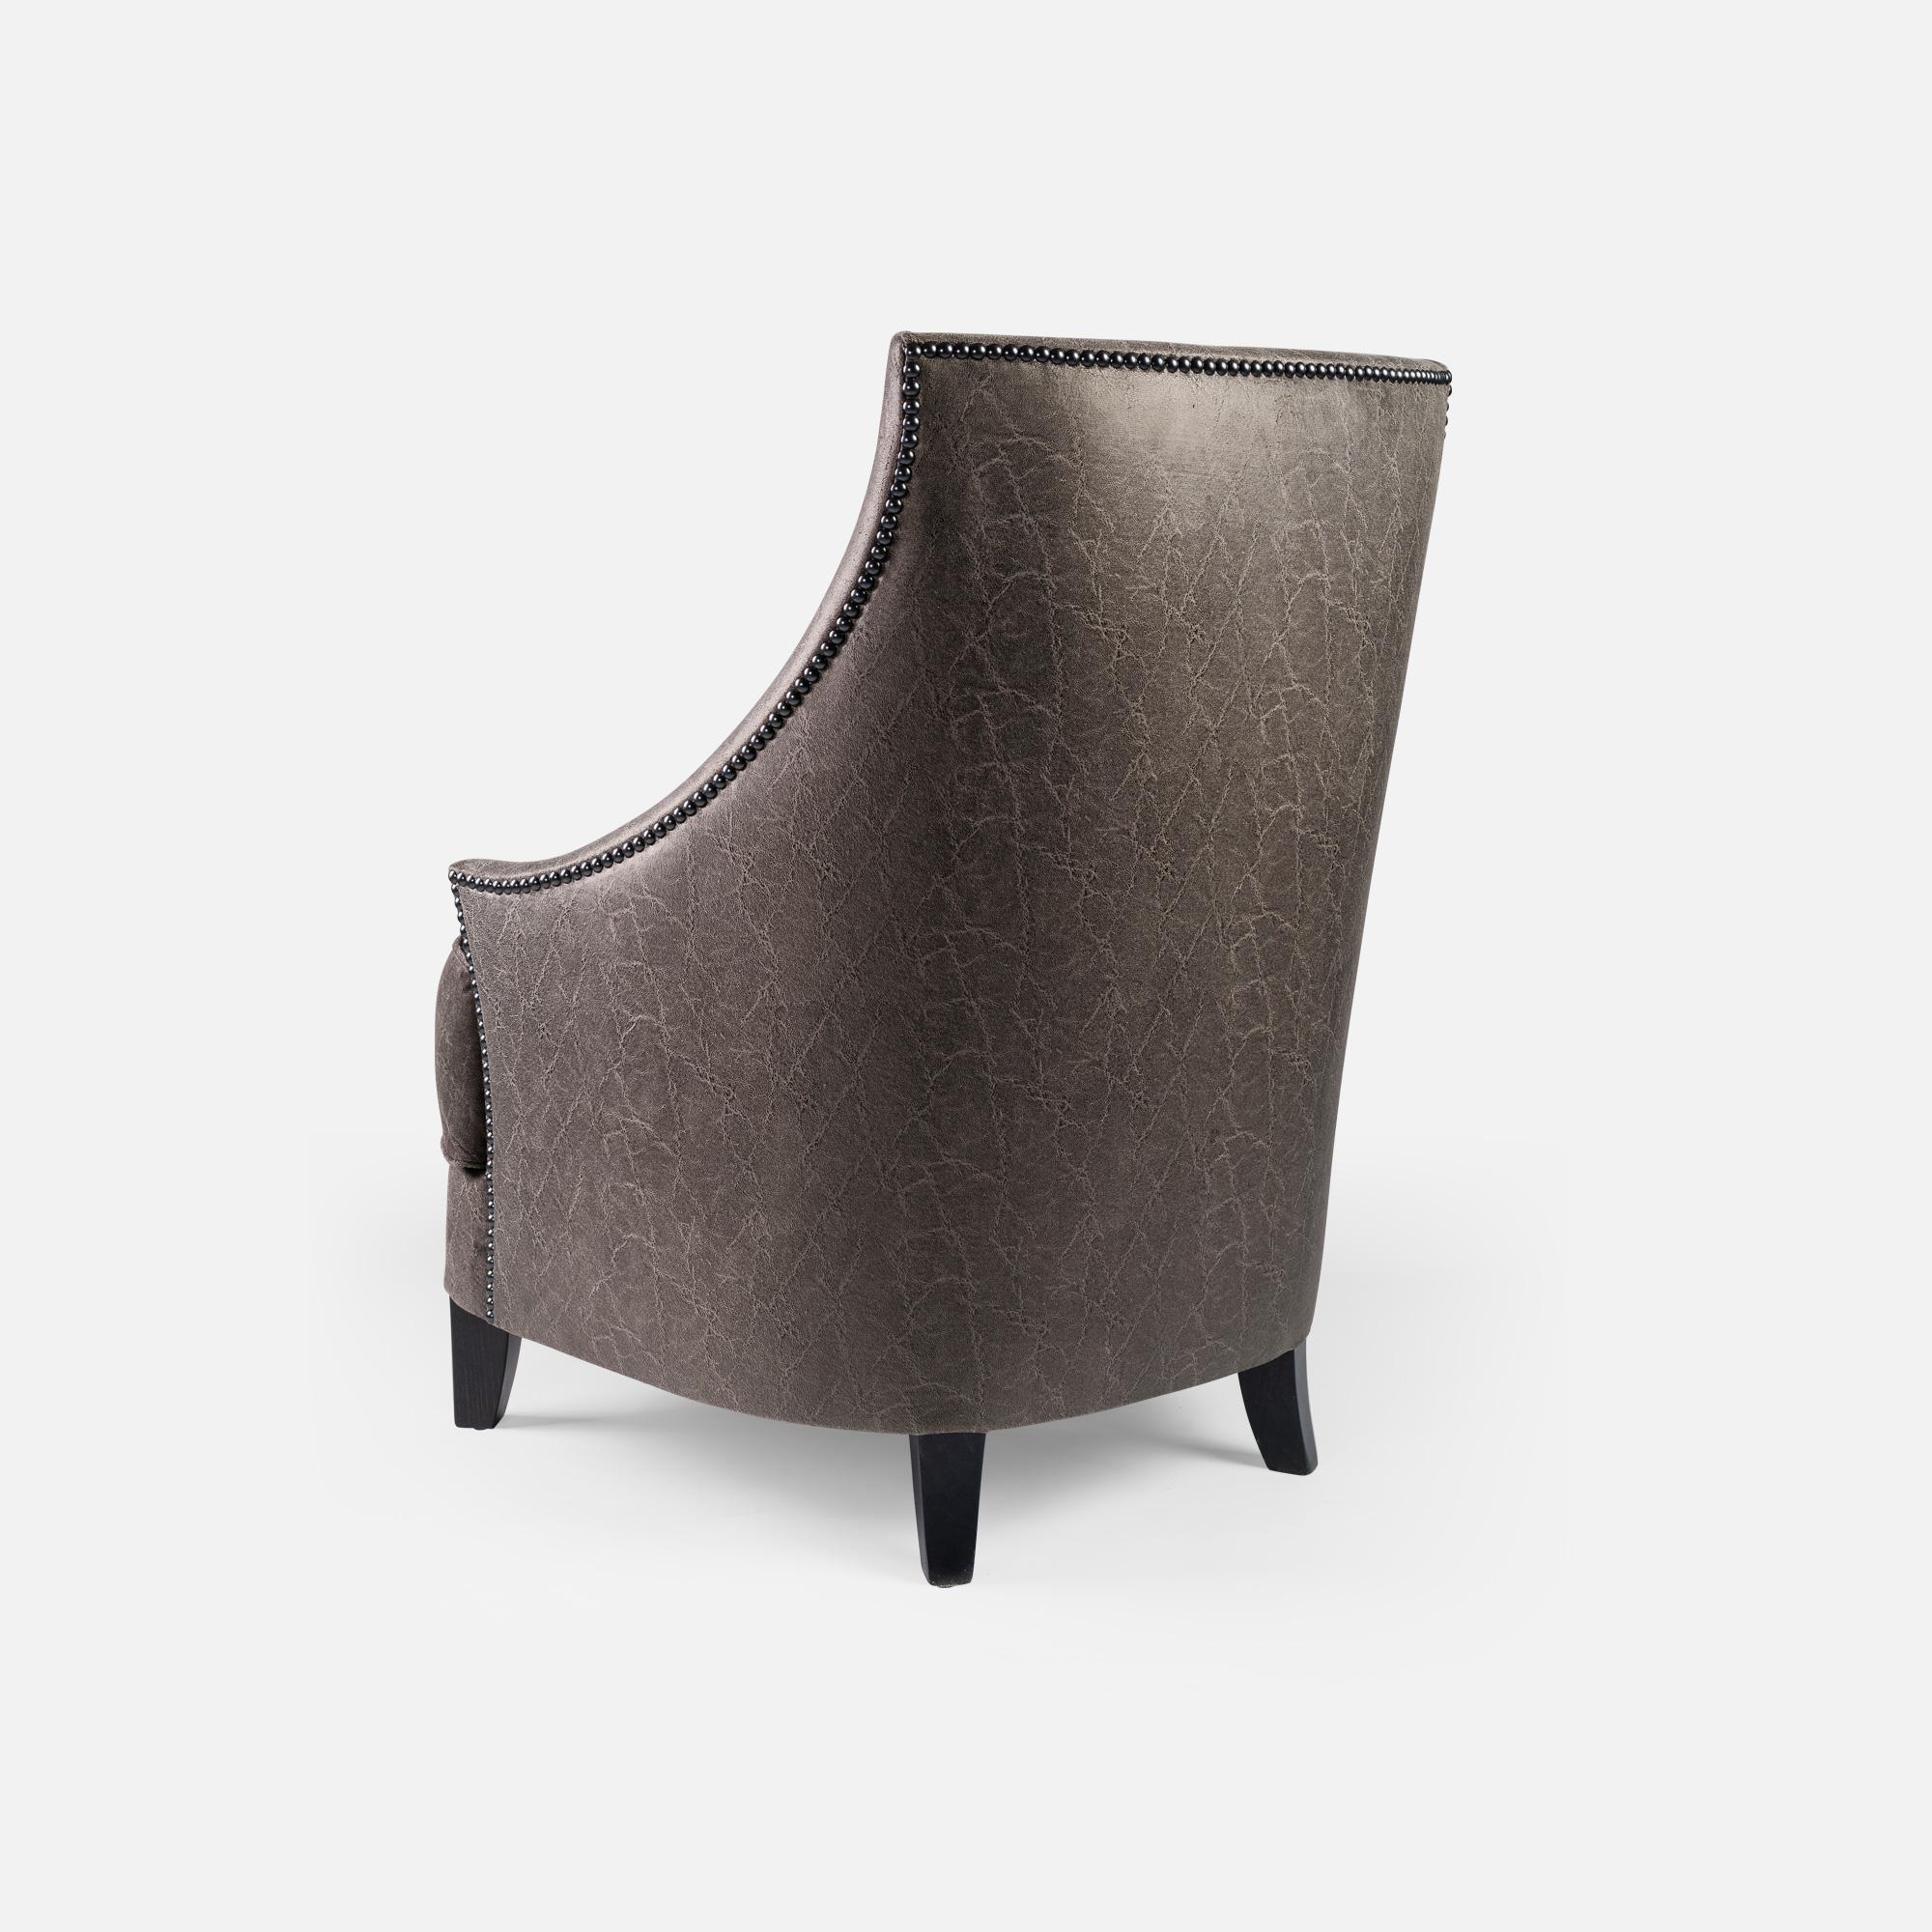 Tub Armchair for Hotel, restaurant, bar: Zuma | Collinet